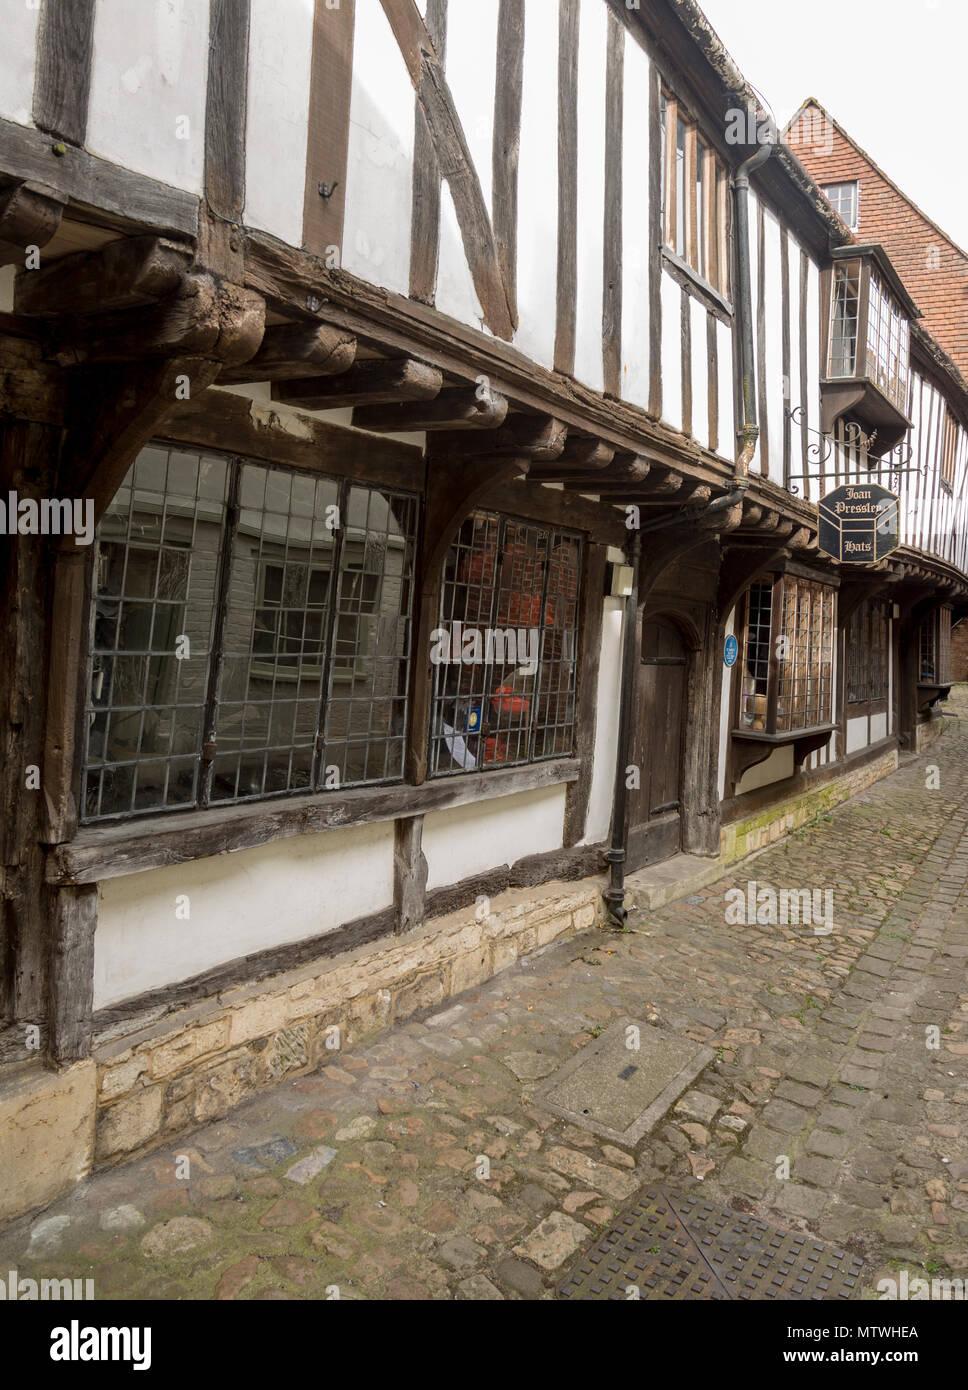 Joan Presley hats shop, fifteenth century architecture, St John's Alley, Devizes, Wiltshire, England, UK - Stock Image